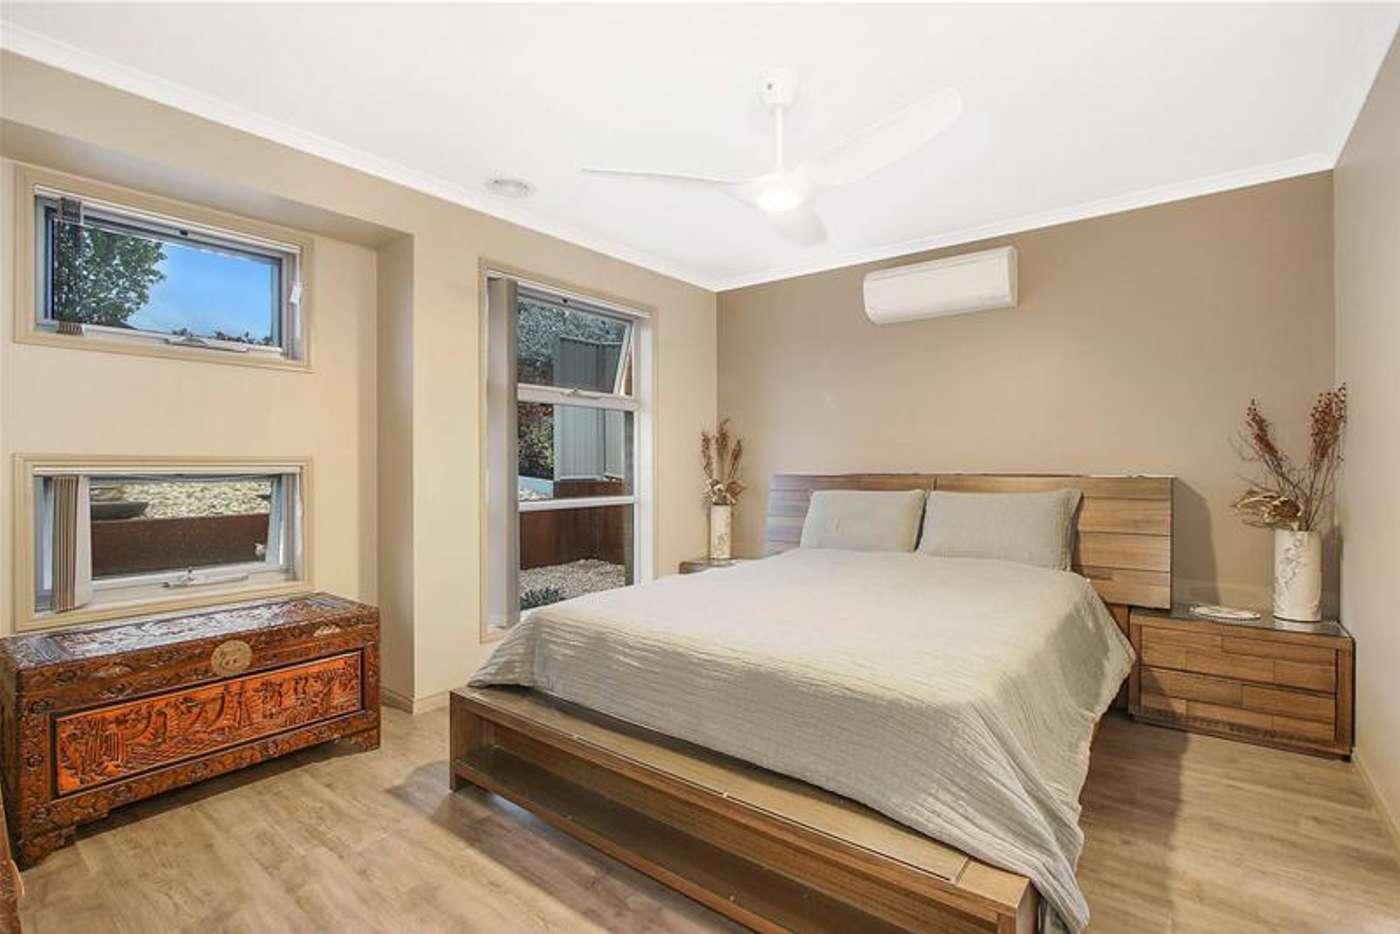 Fifth view of Homely house listing, 91 Yarralumla Drive, Wodonga VIC 3690